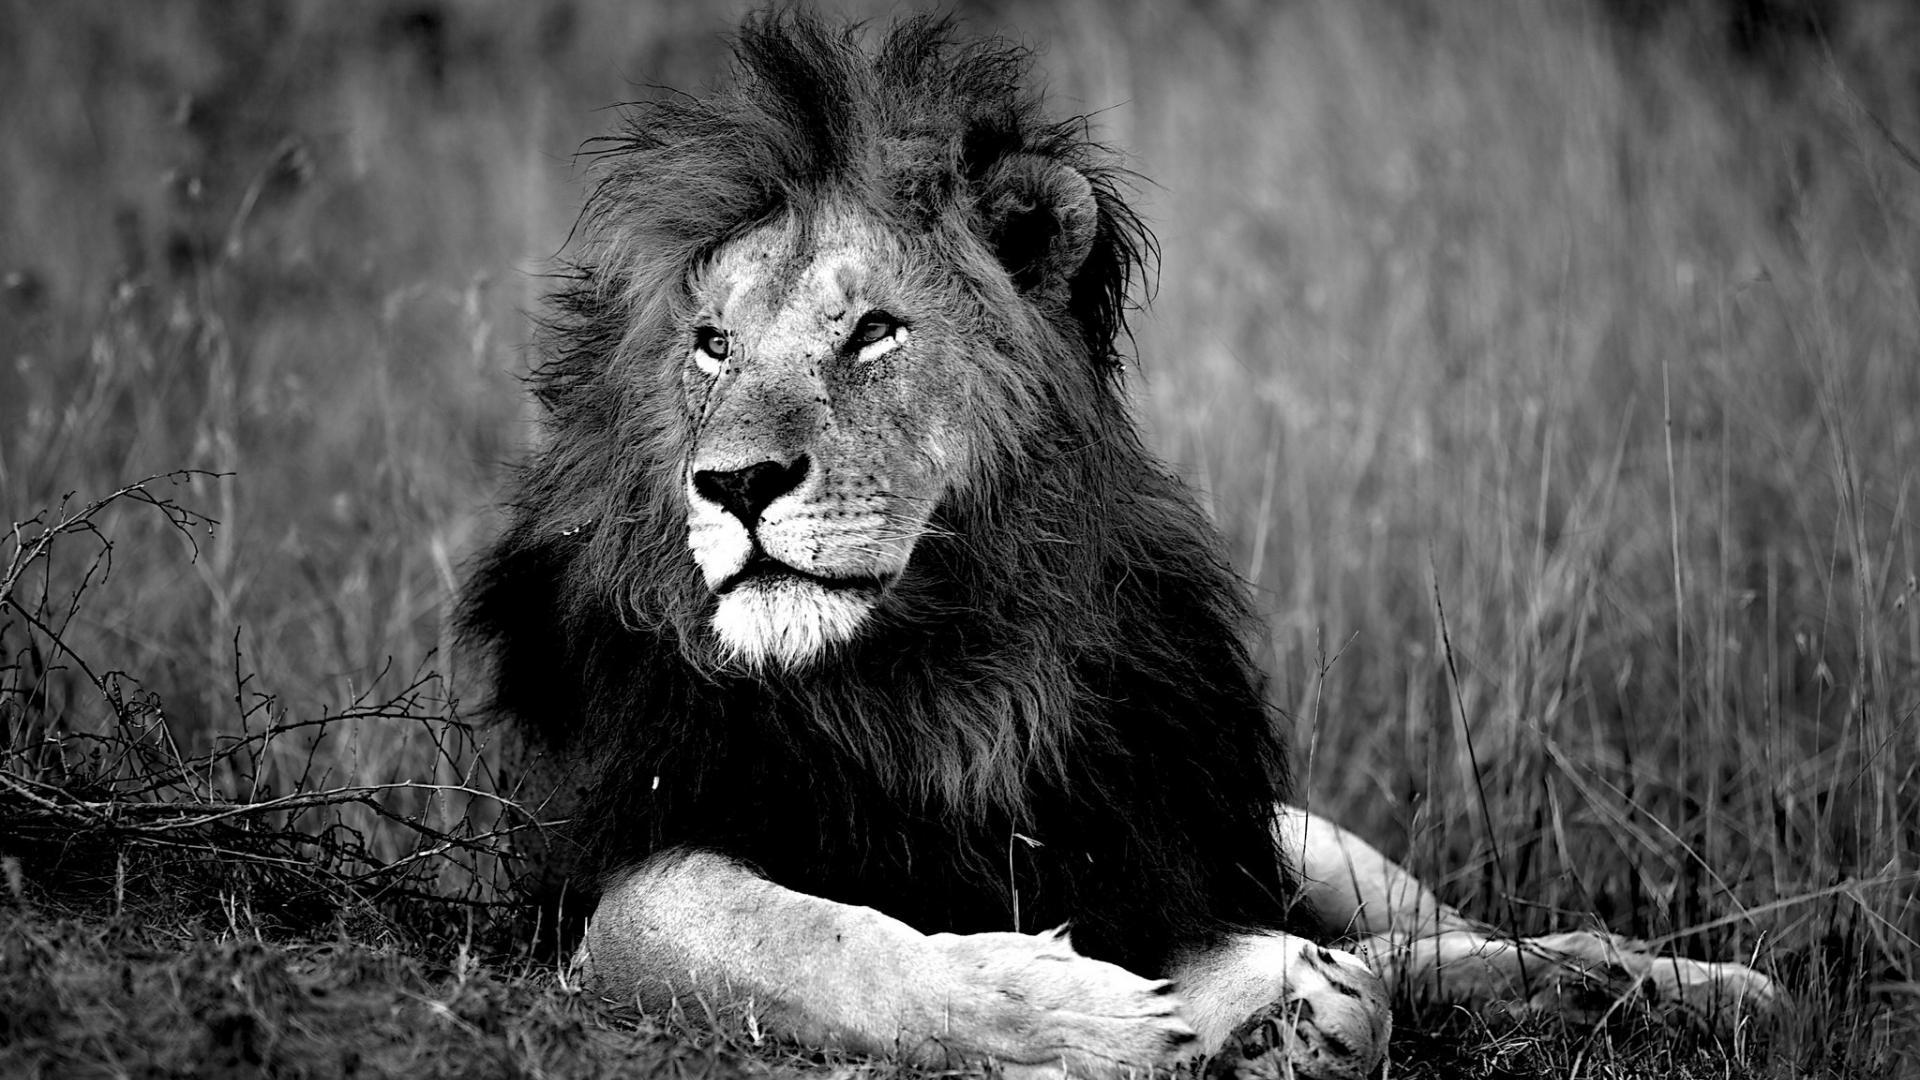 44 Black Lion Hd Wallpaper On Wallpapersafari